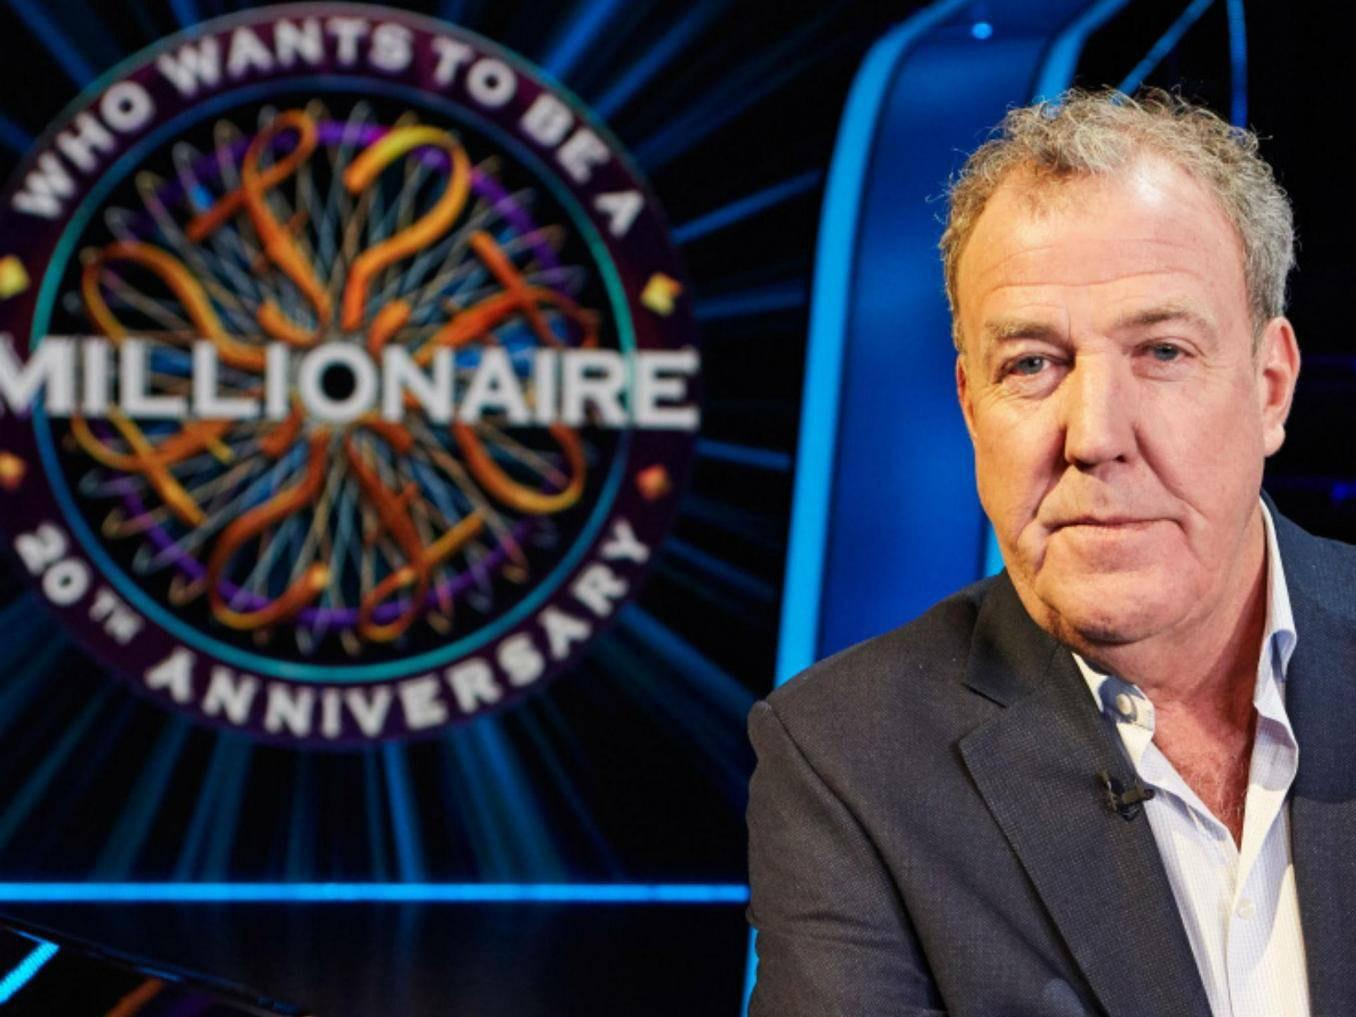 jeremy clarkson millionaire - photo #6